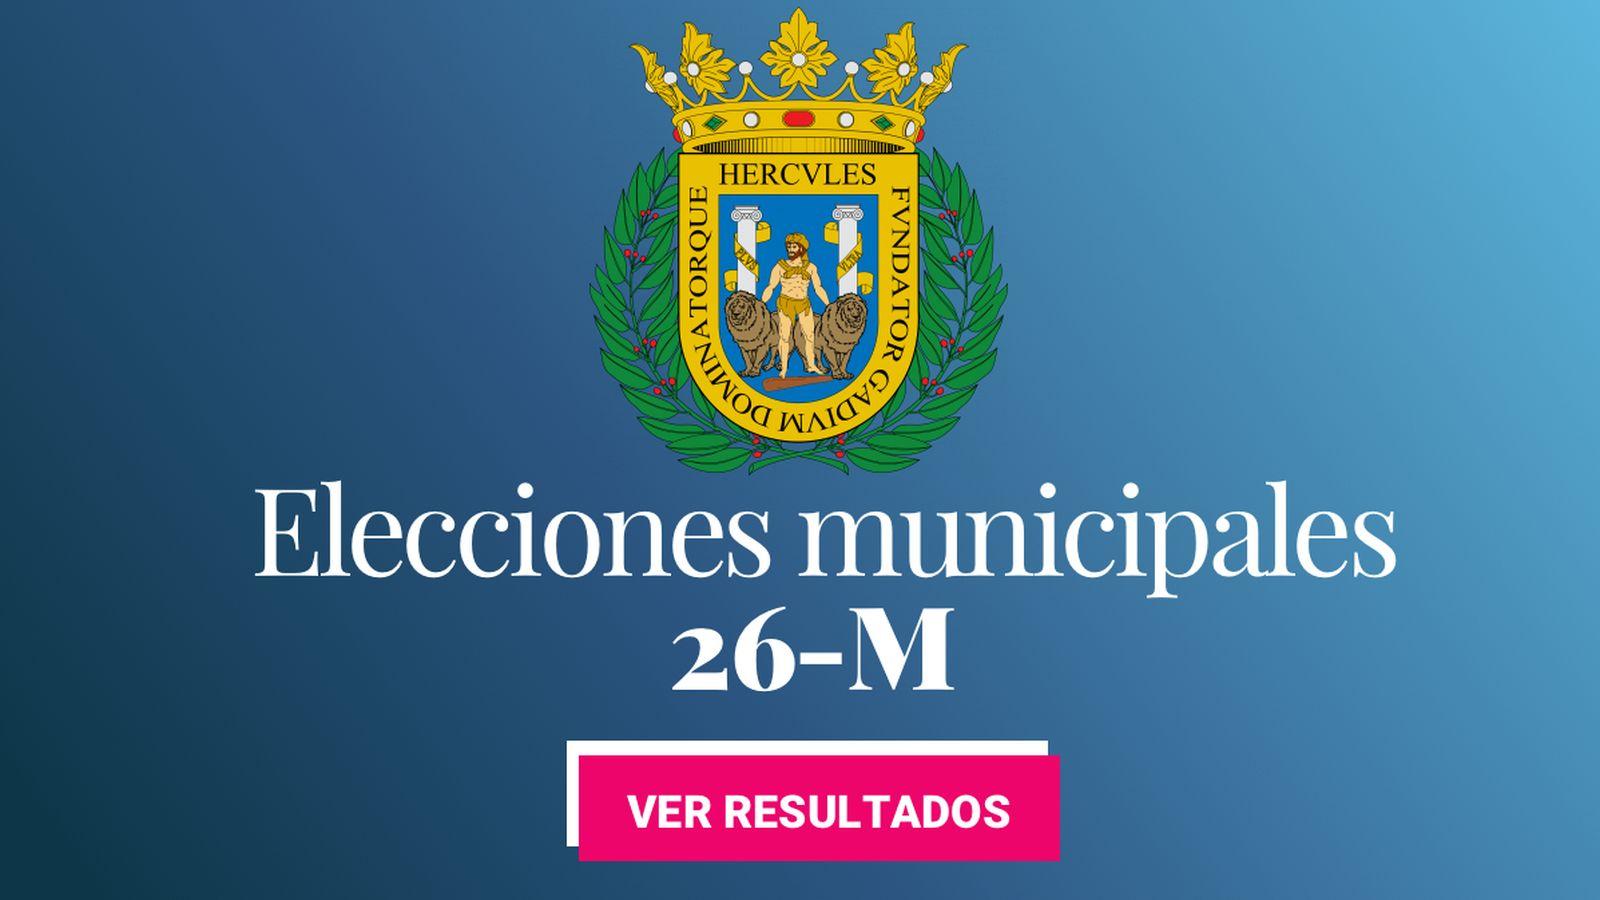 Foto: Elecciones municipales 2019 en Cádiz. (C.C./EC)